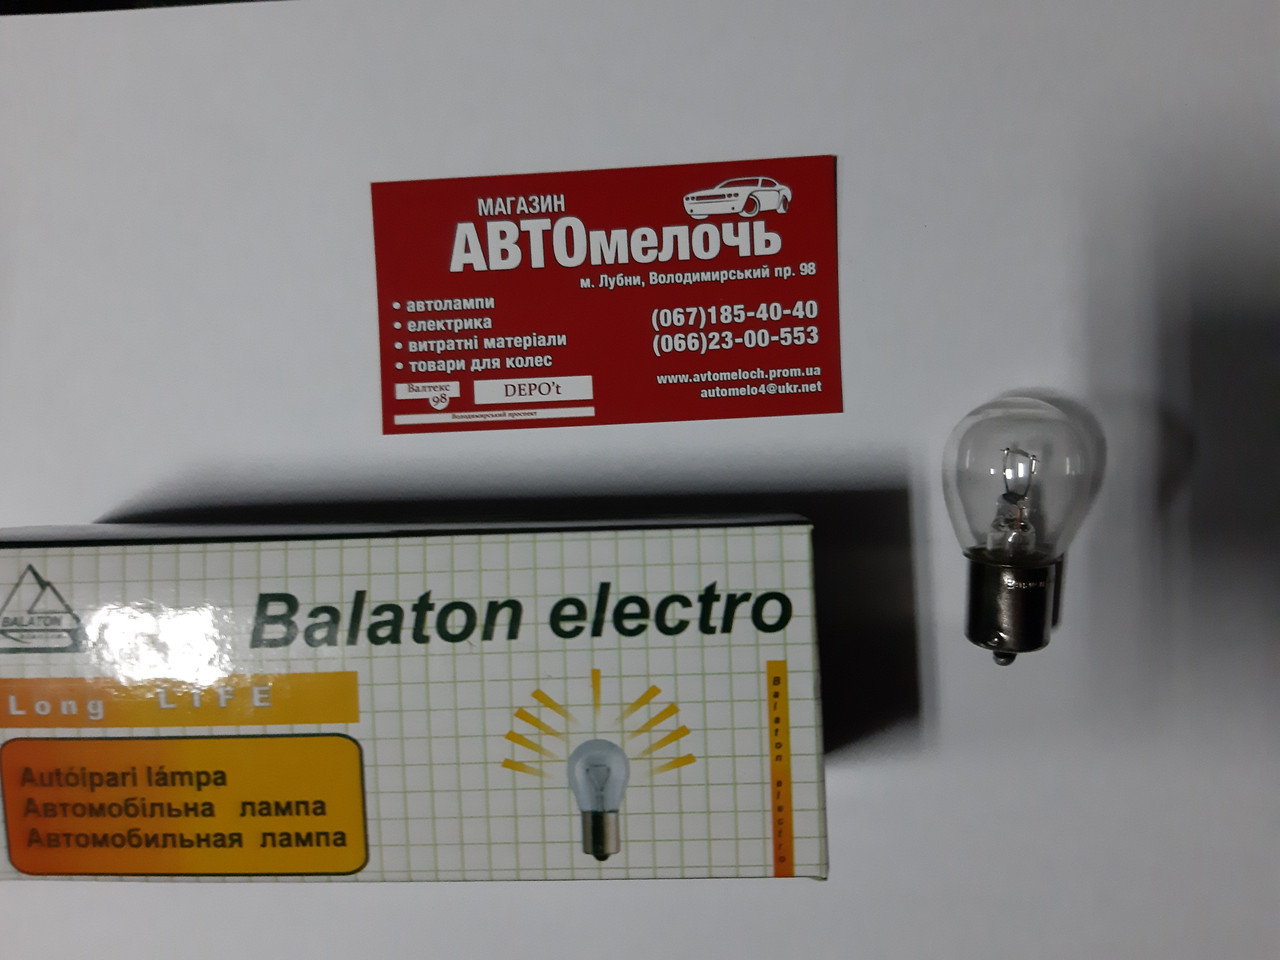 Лампа 12V 21W 1 контакт смещённый цоколь пр-во Balaton